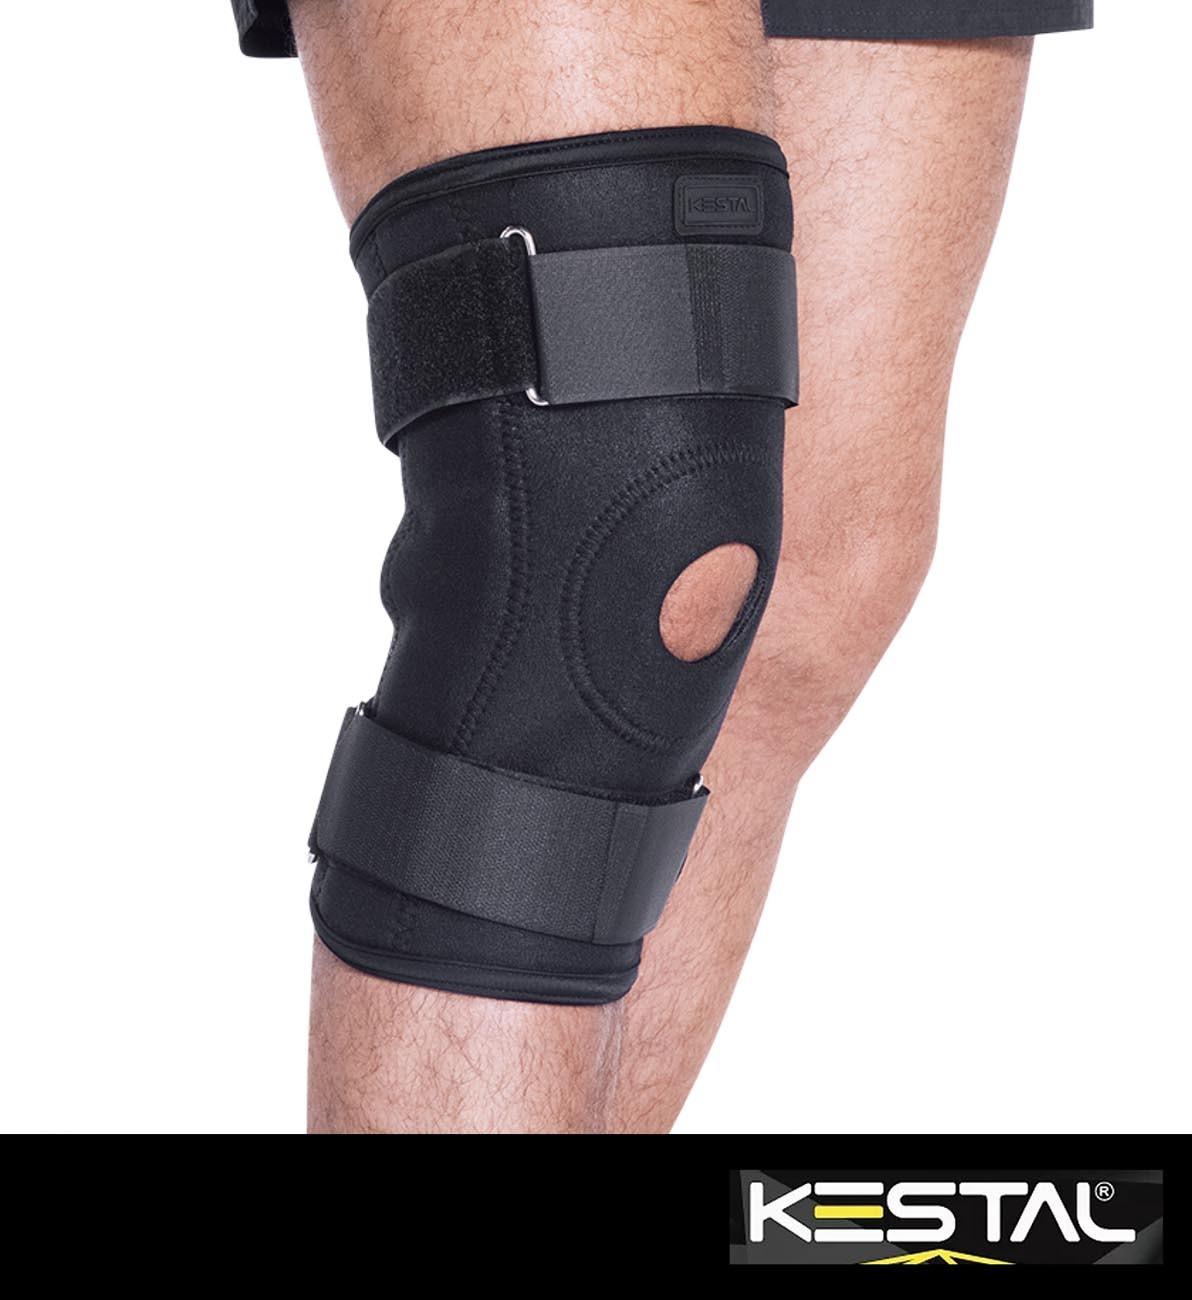 Joelheira Articulada Ajustável (KSN004) - Kestal